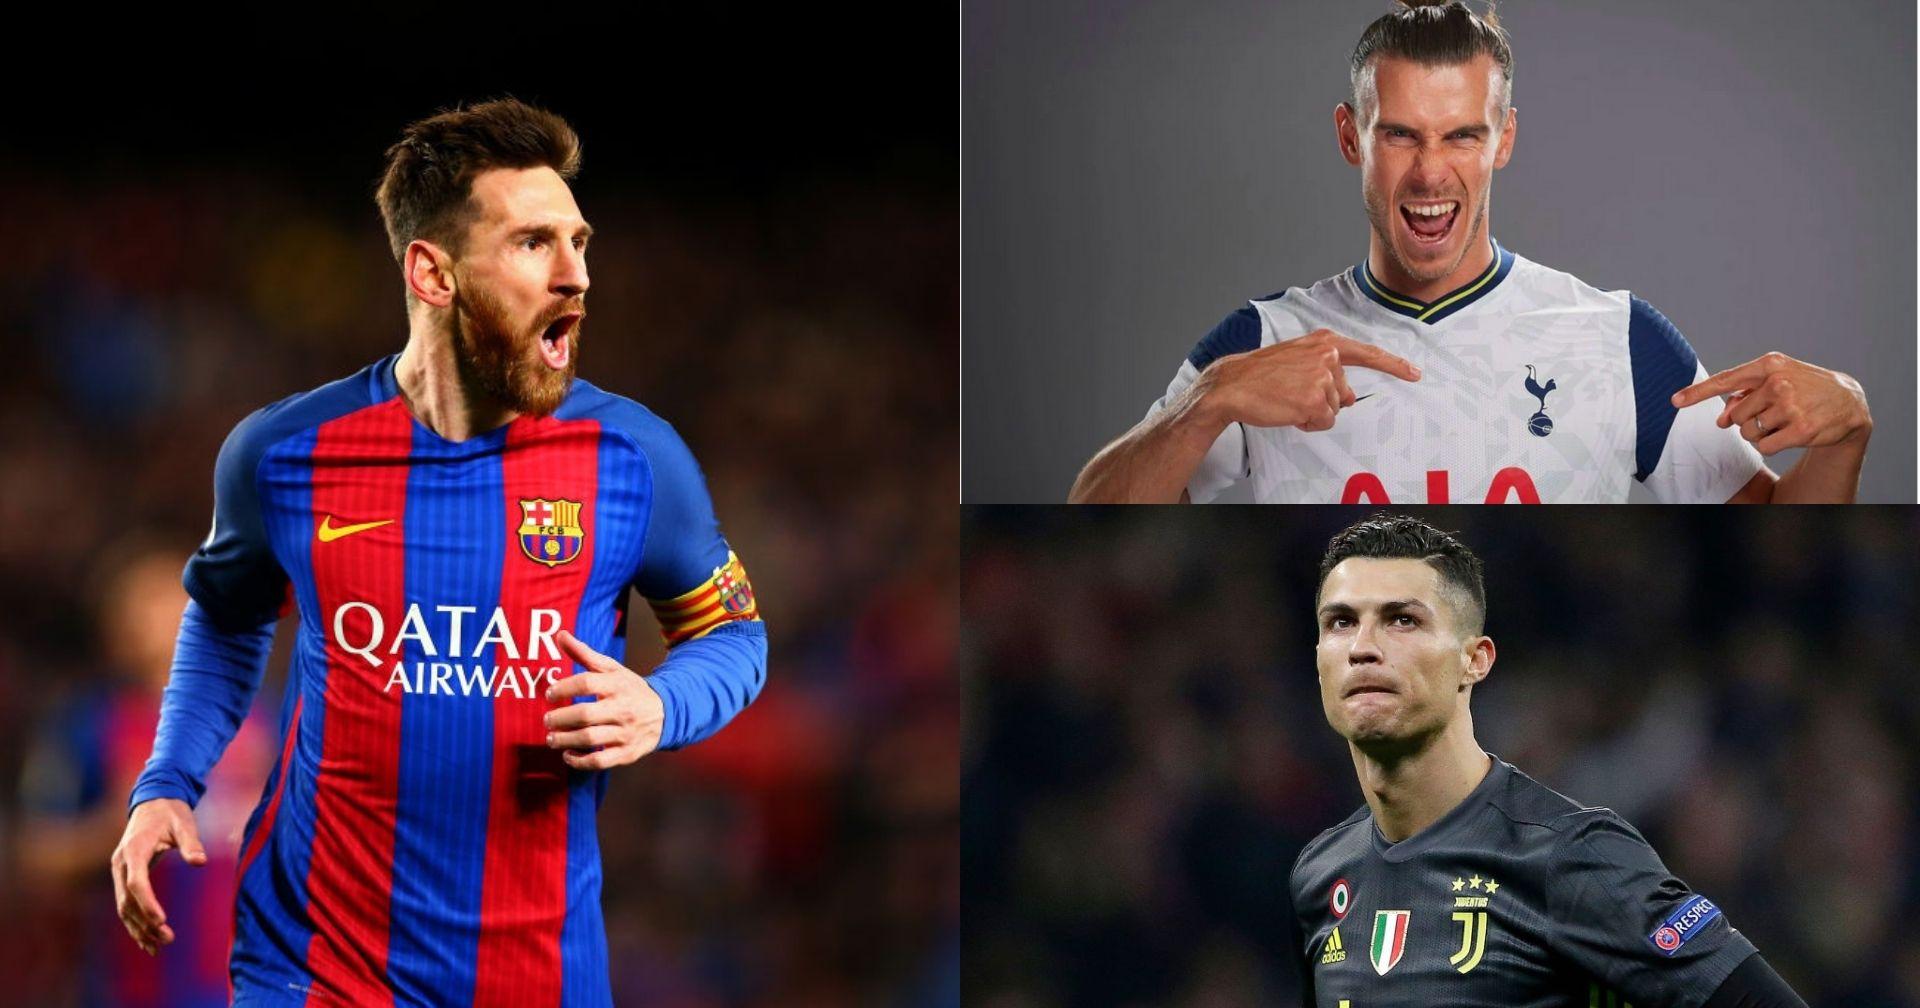 Messi, Ronaldo, Bale